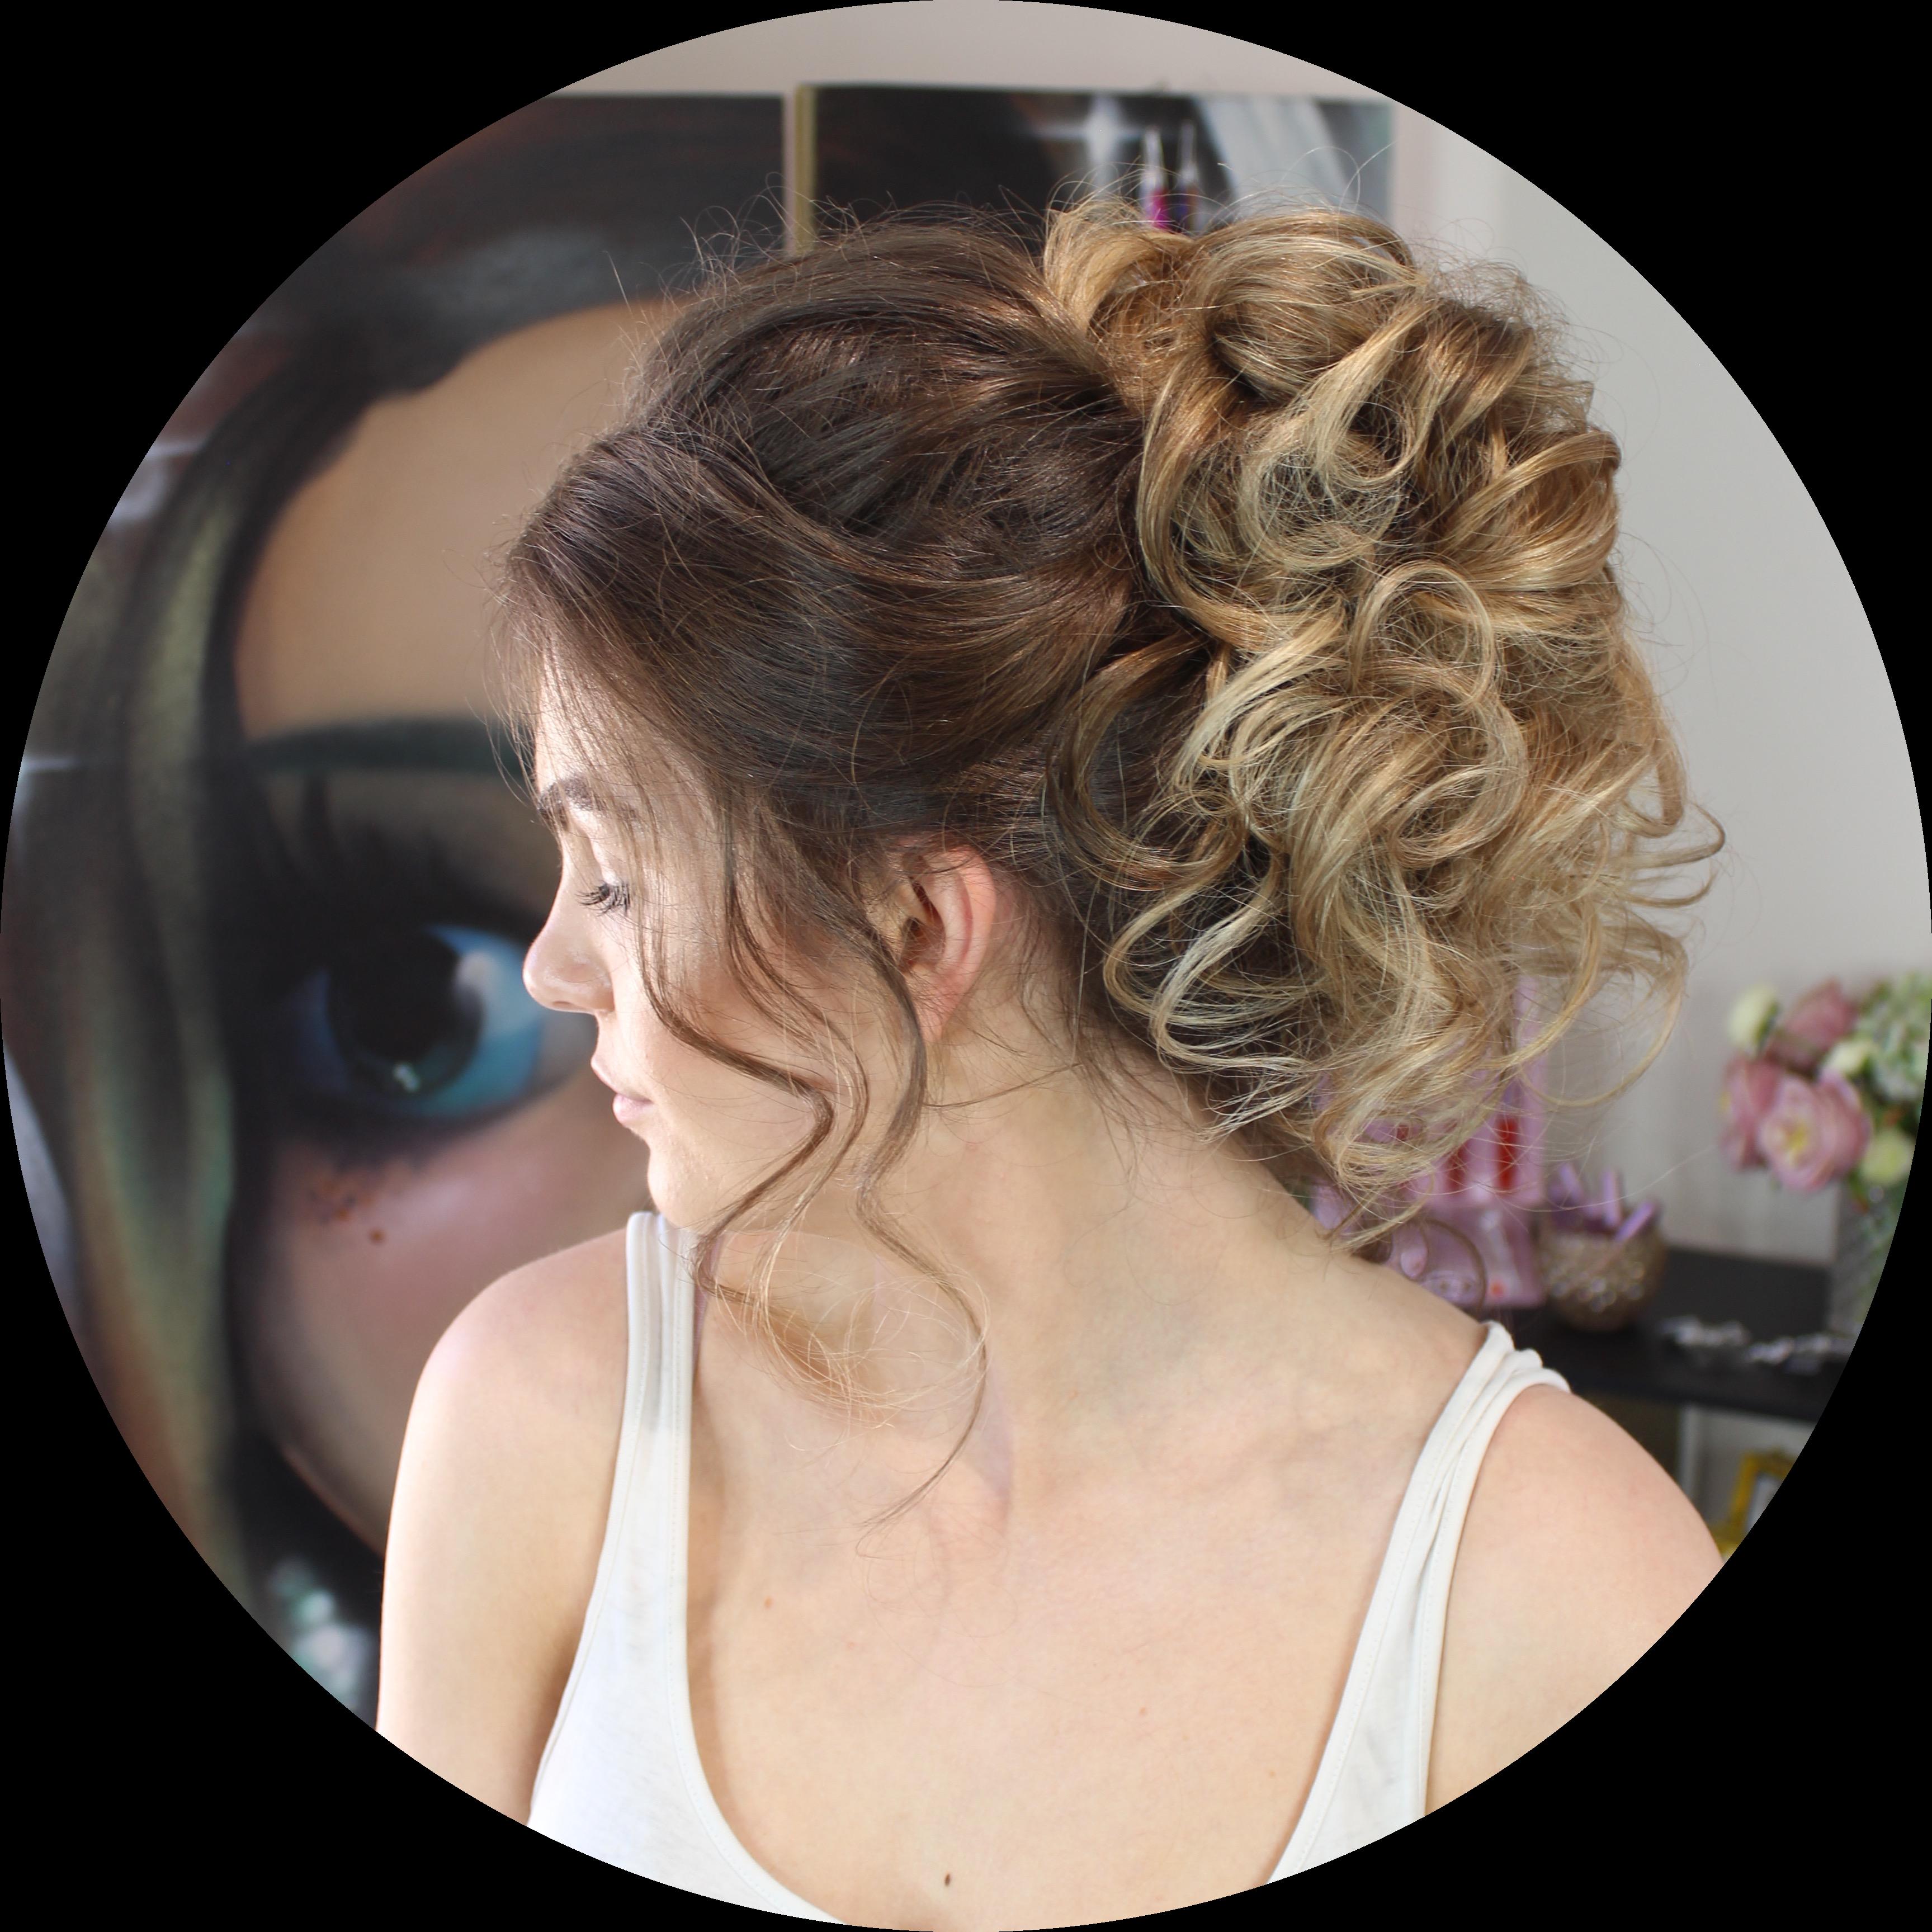 Learn Hair Step by Step